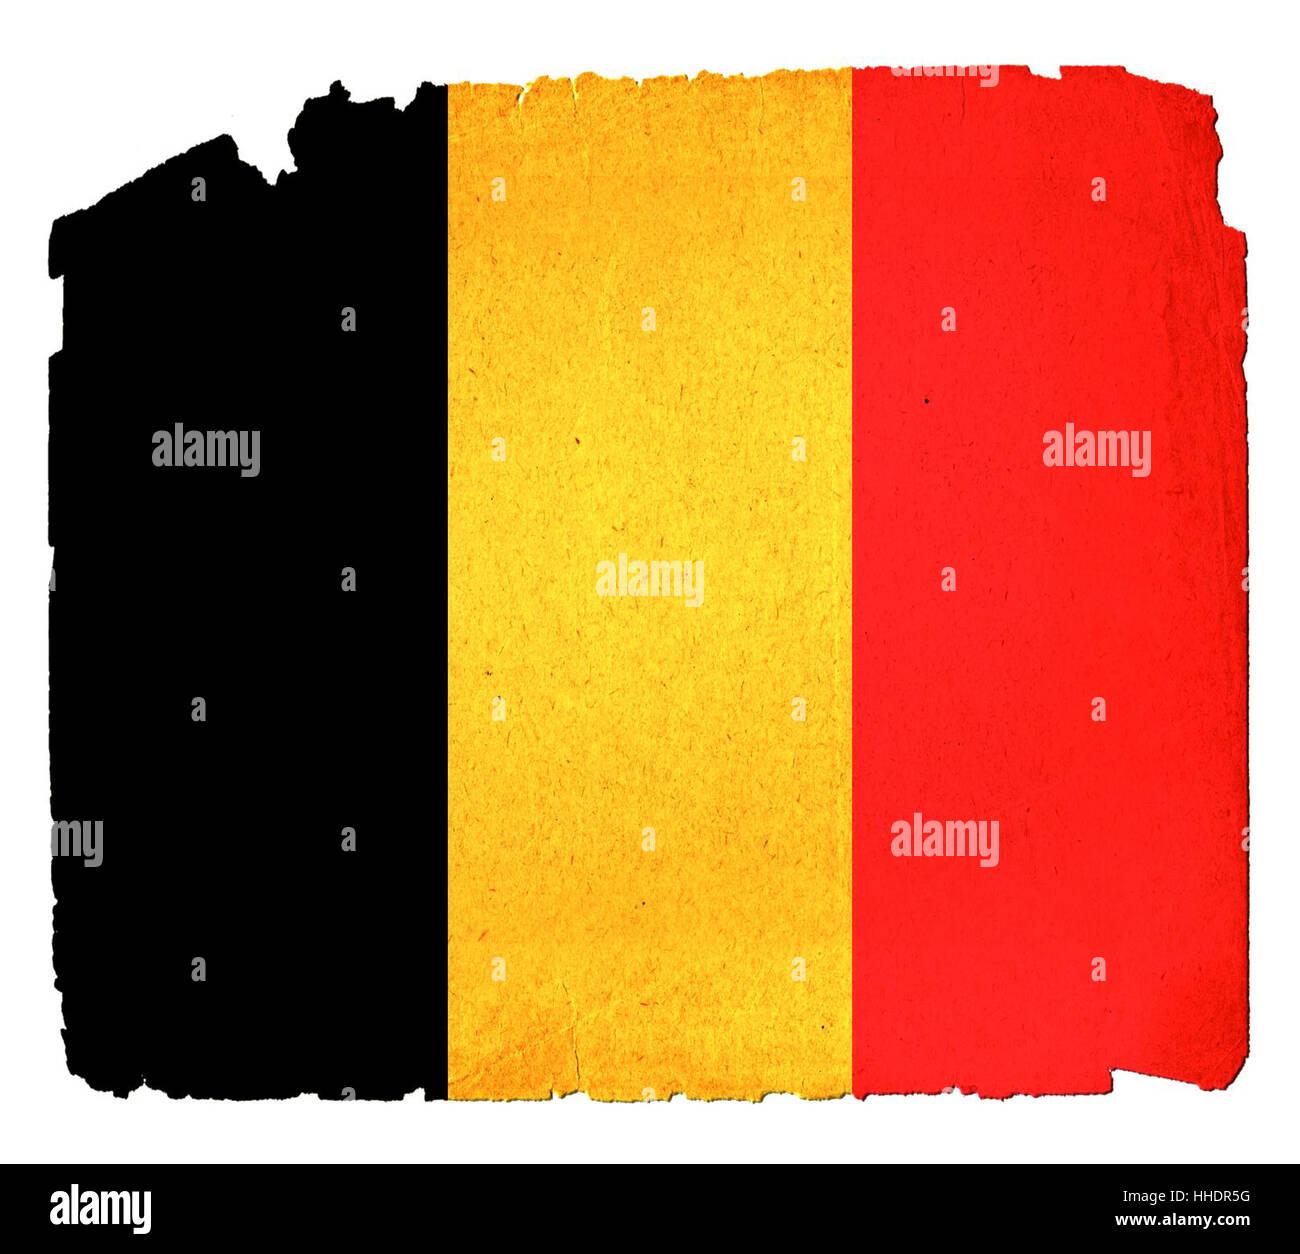 Belgien, Flagge, Flaggen, Long shot, retro, Kutte, absolut, Dekorationen, Stockbild